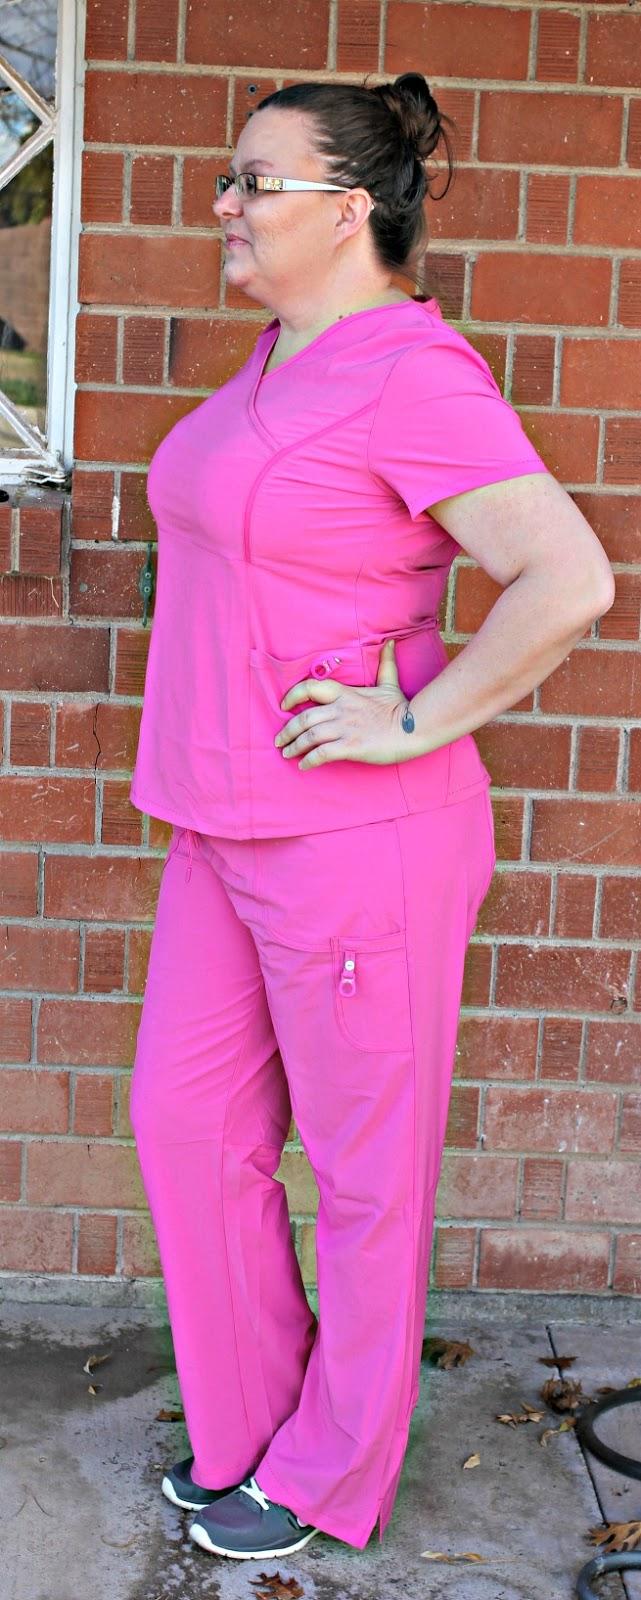 Clinical Scrubs: Style + Function (Plus a Giveaway!), Landau Scrubs Review